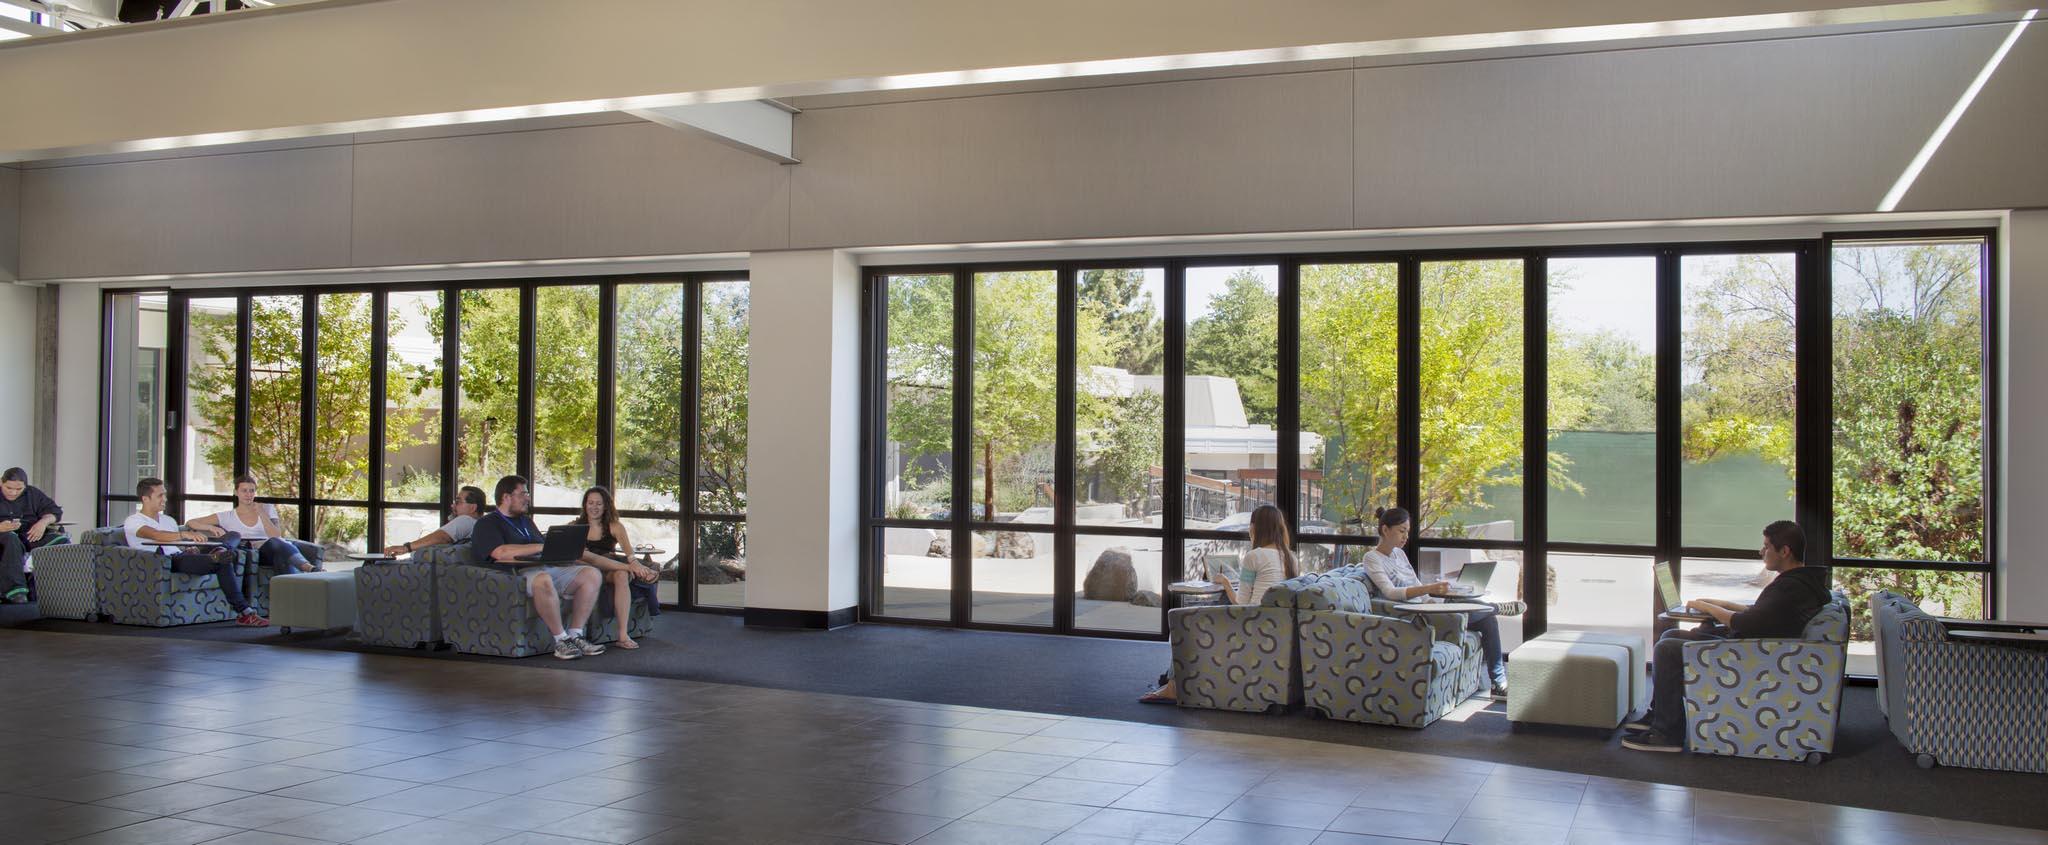 West Valley College Interior Design West Valley College  Nanawall